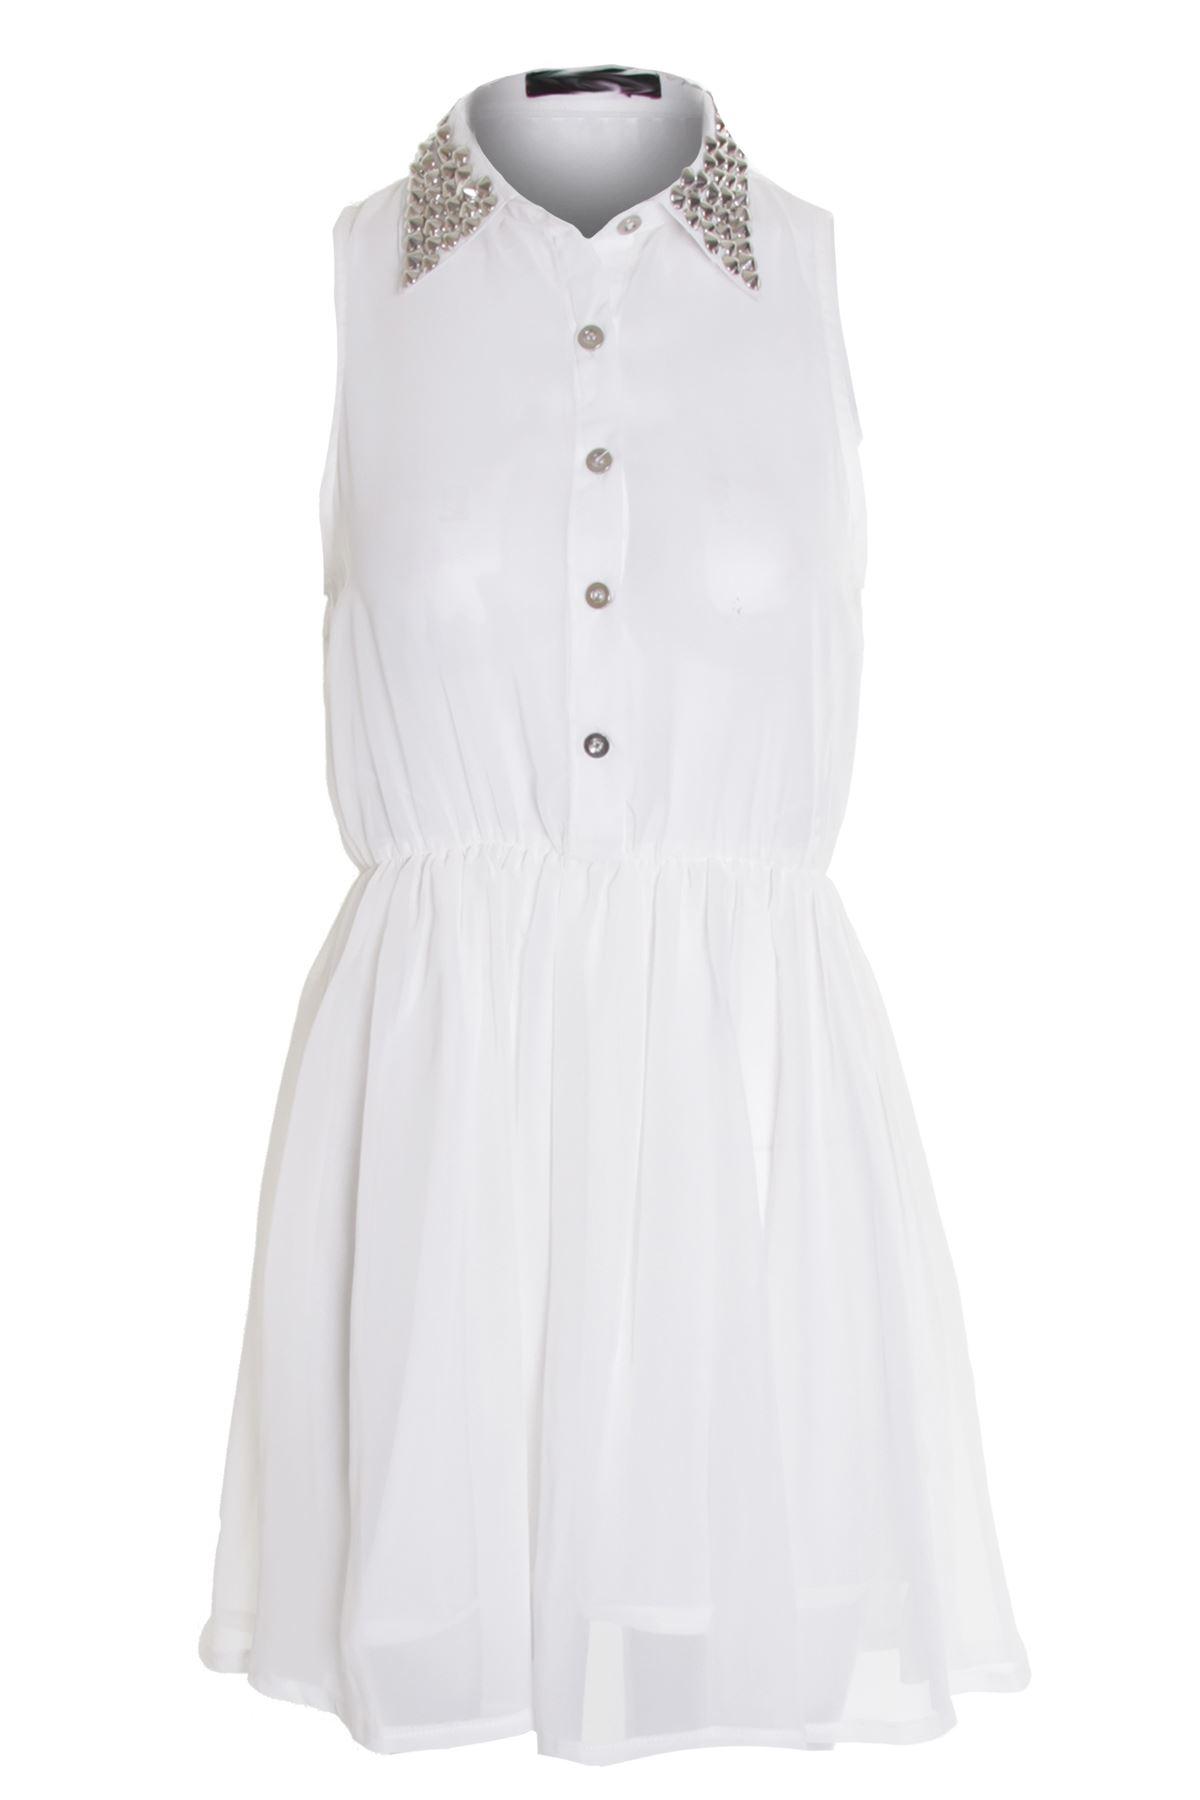 0319fa445dade7 Women's Red White Black Collar Silver Studded Chiffon Ladies Blouse Shirt  Dress